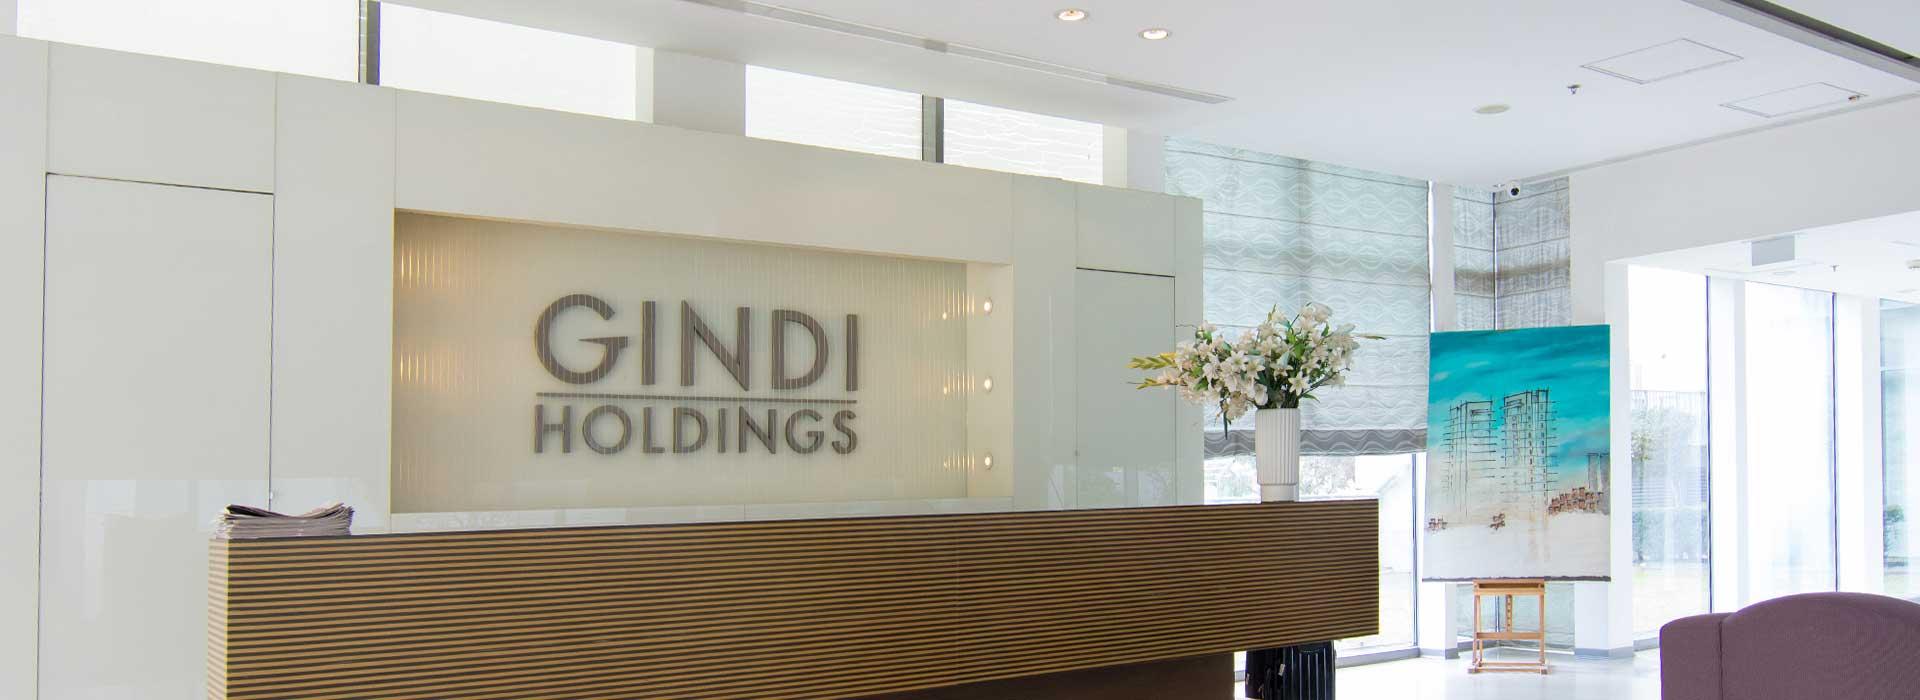 sliders-buildings-gindi